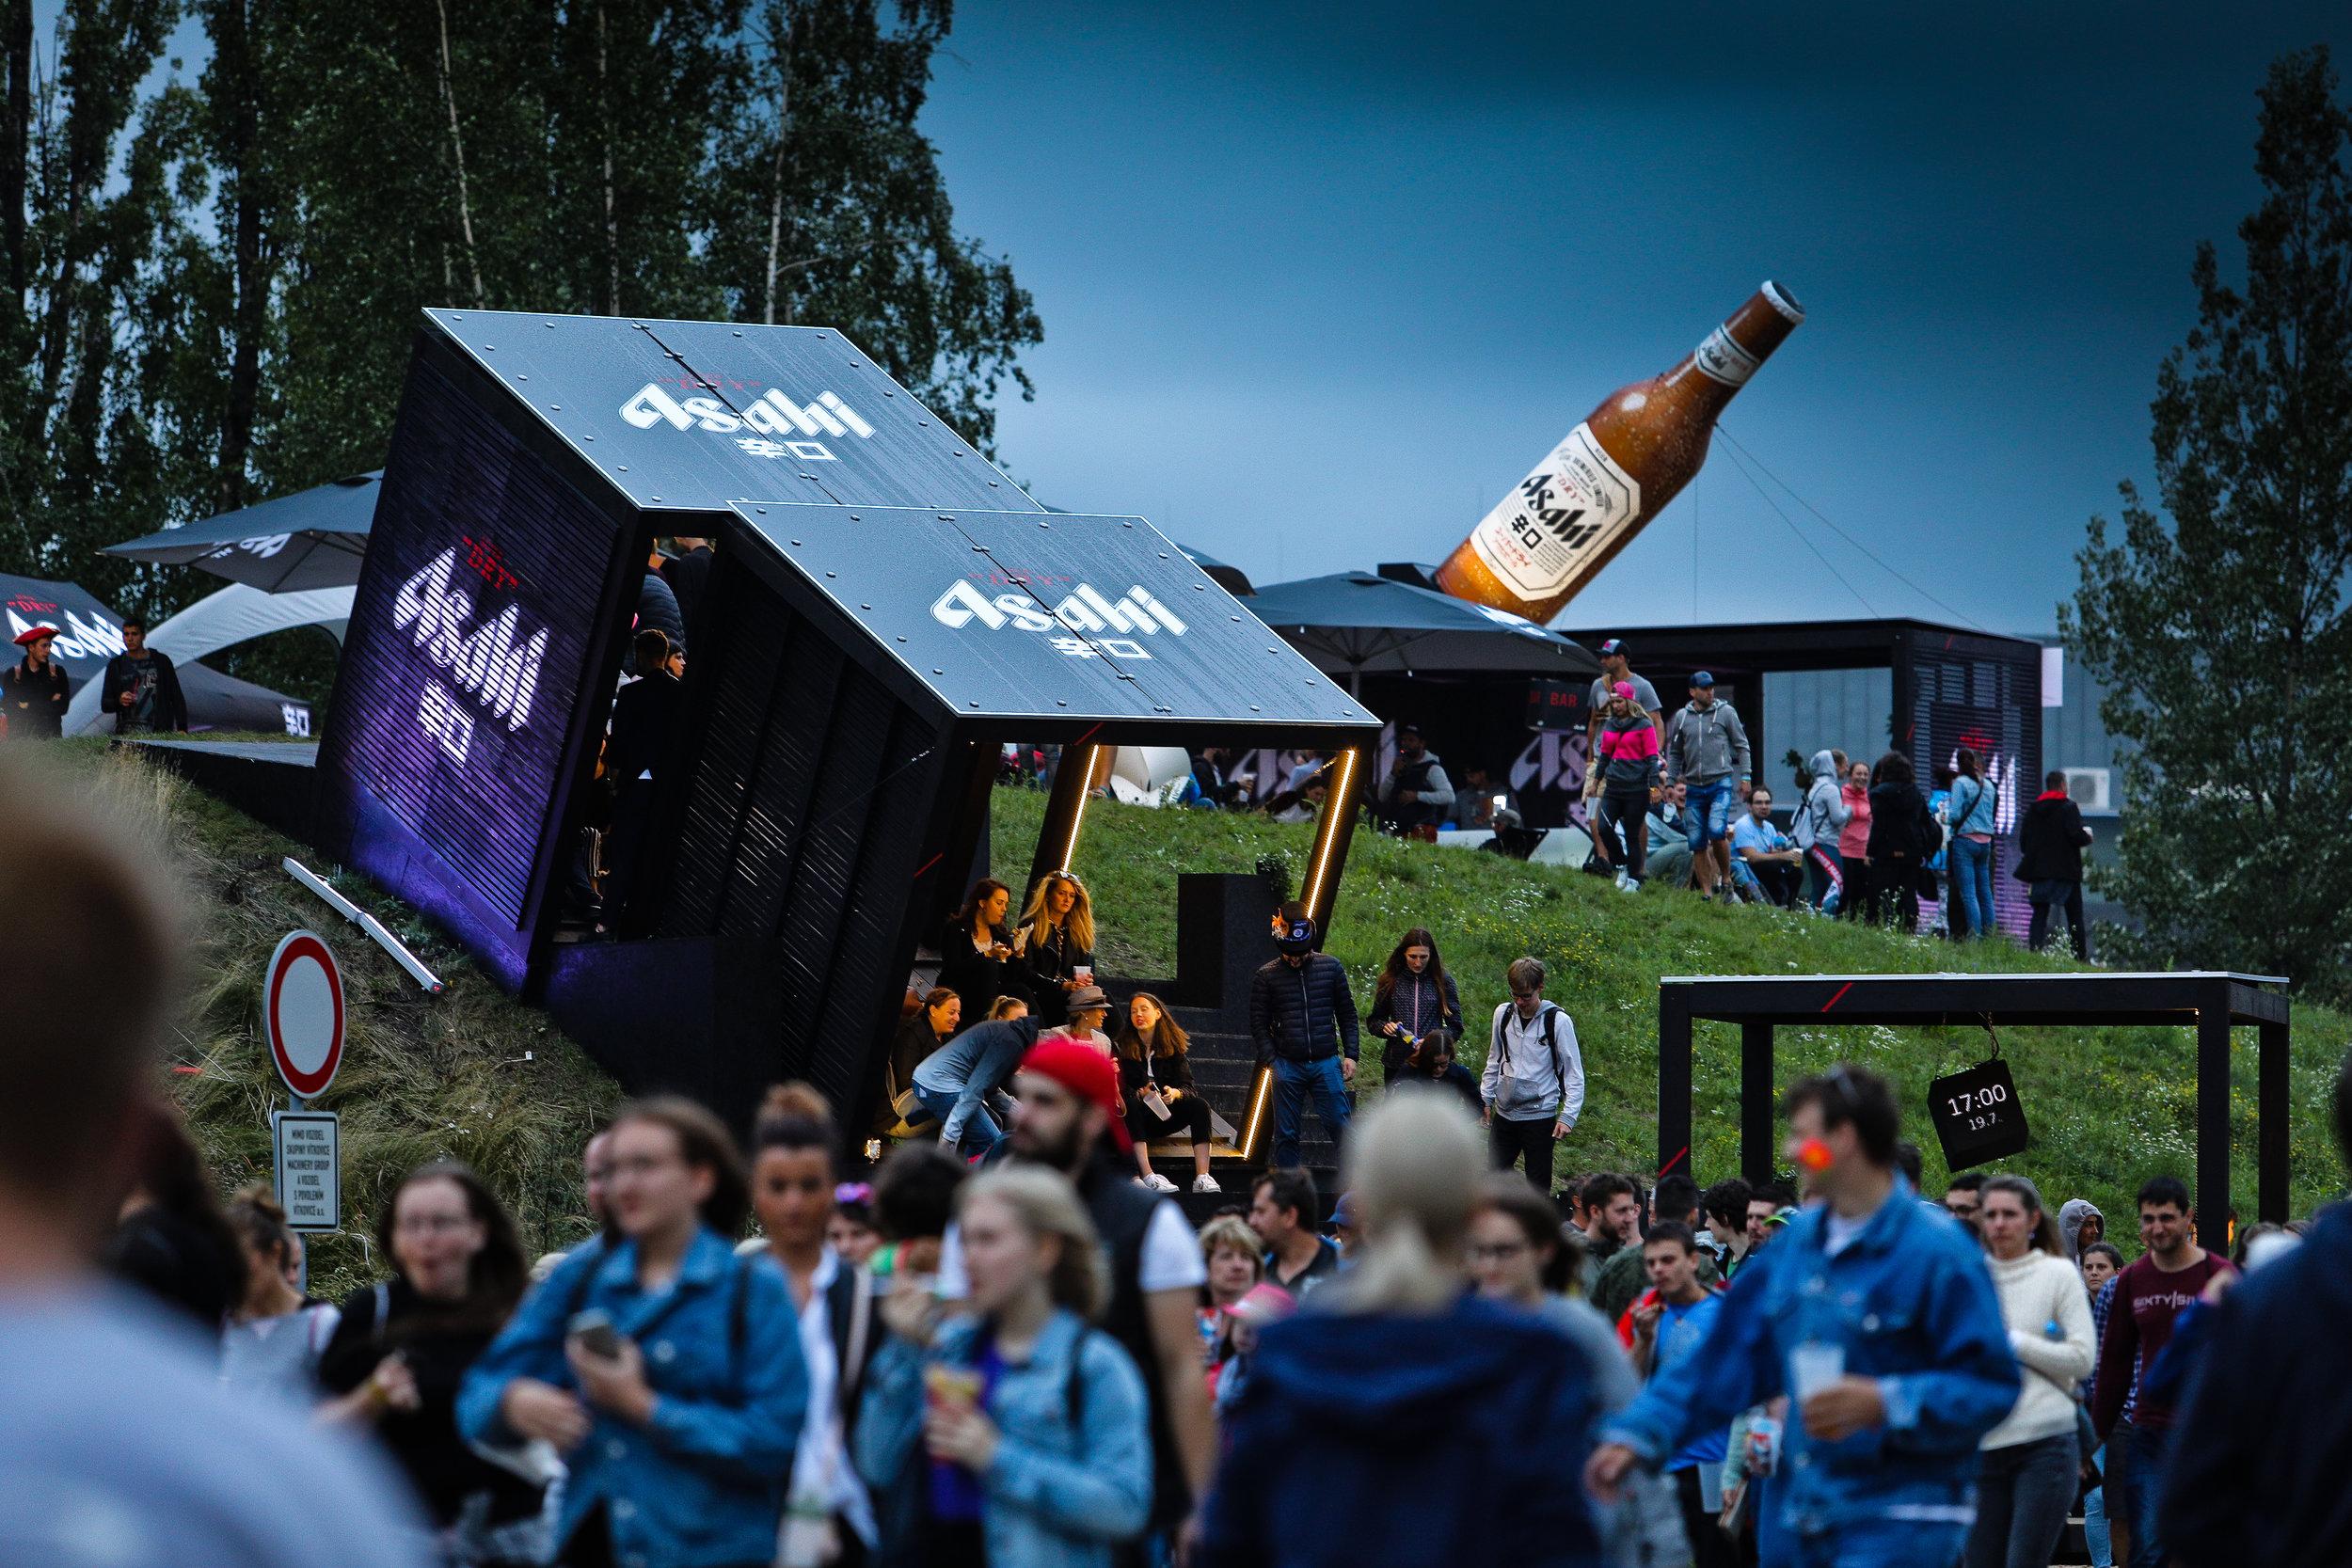 2018  Colours of Ostrava  12 000 visitors (25% of total visitors)